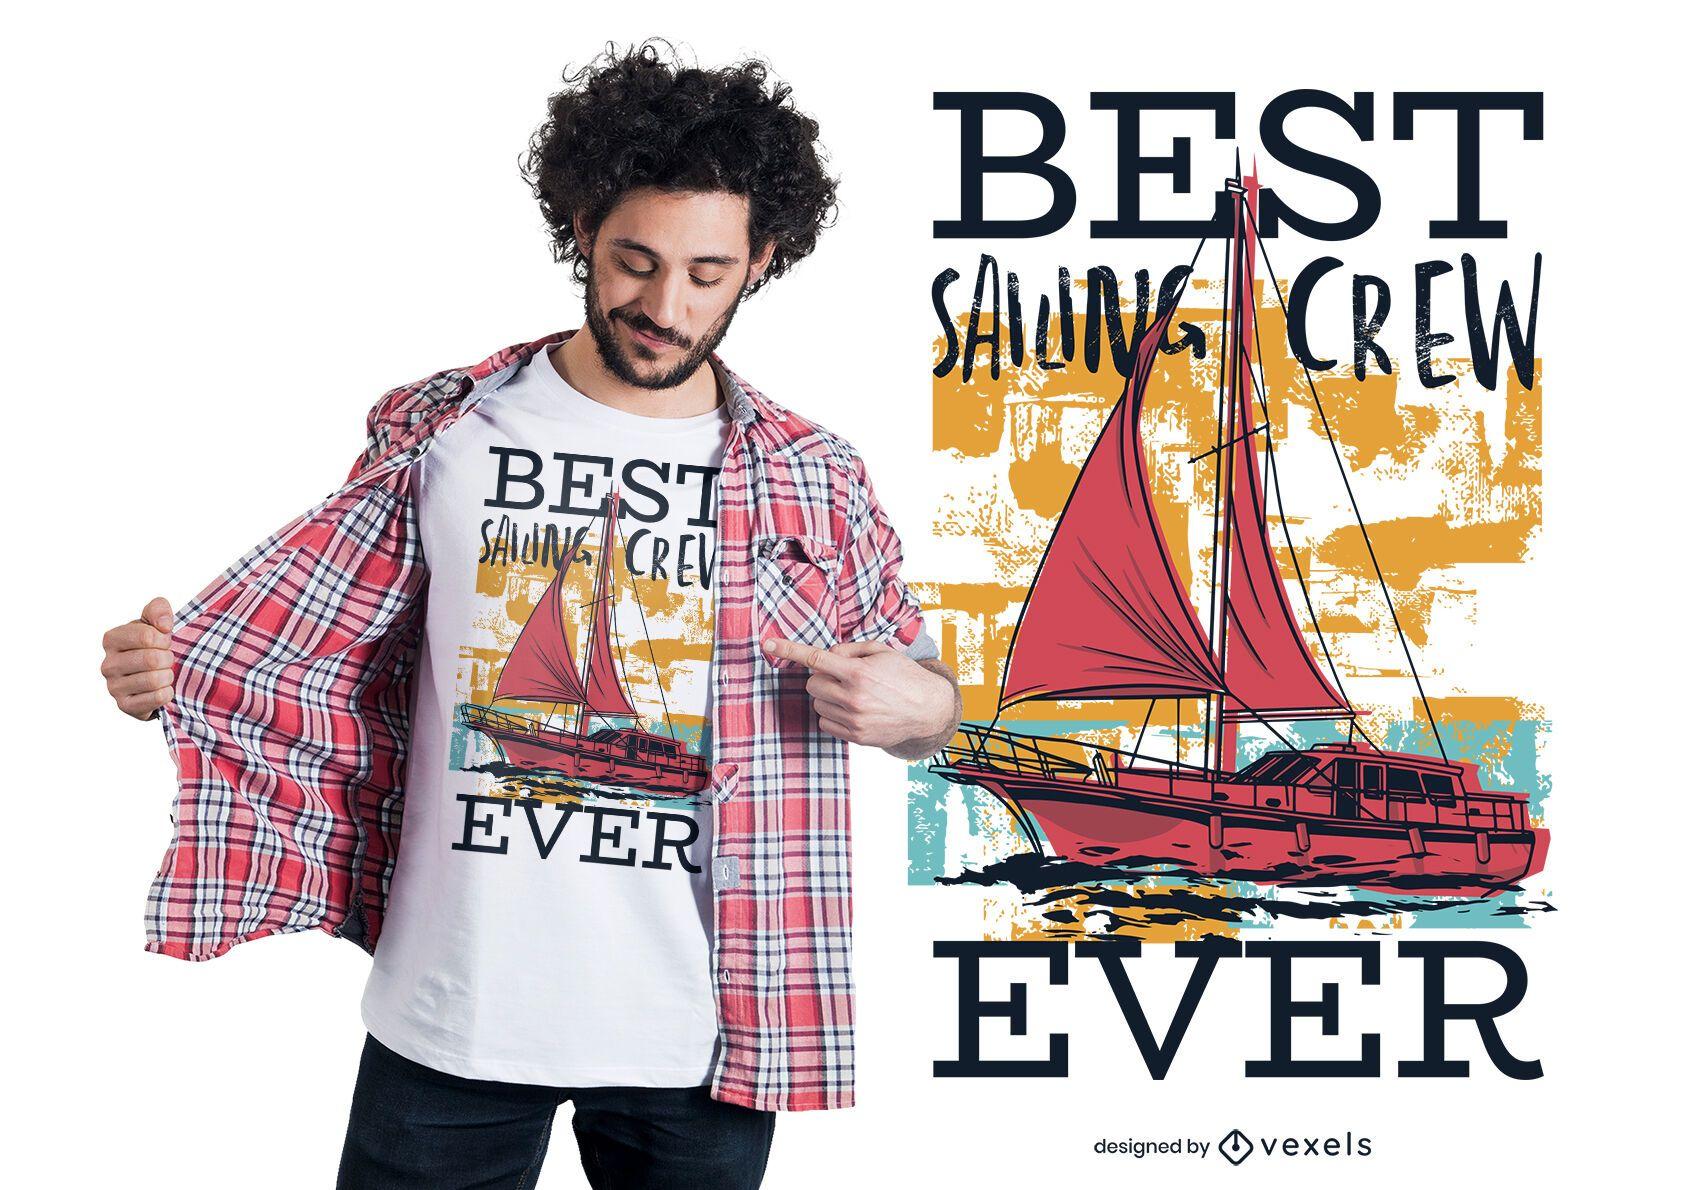 Best Sailing Crew T-shirt Design